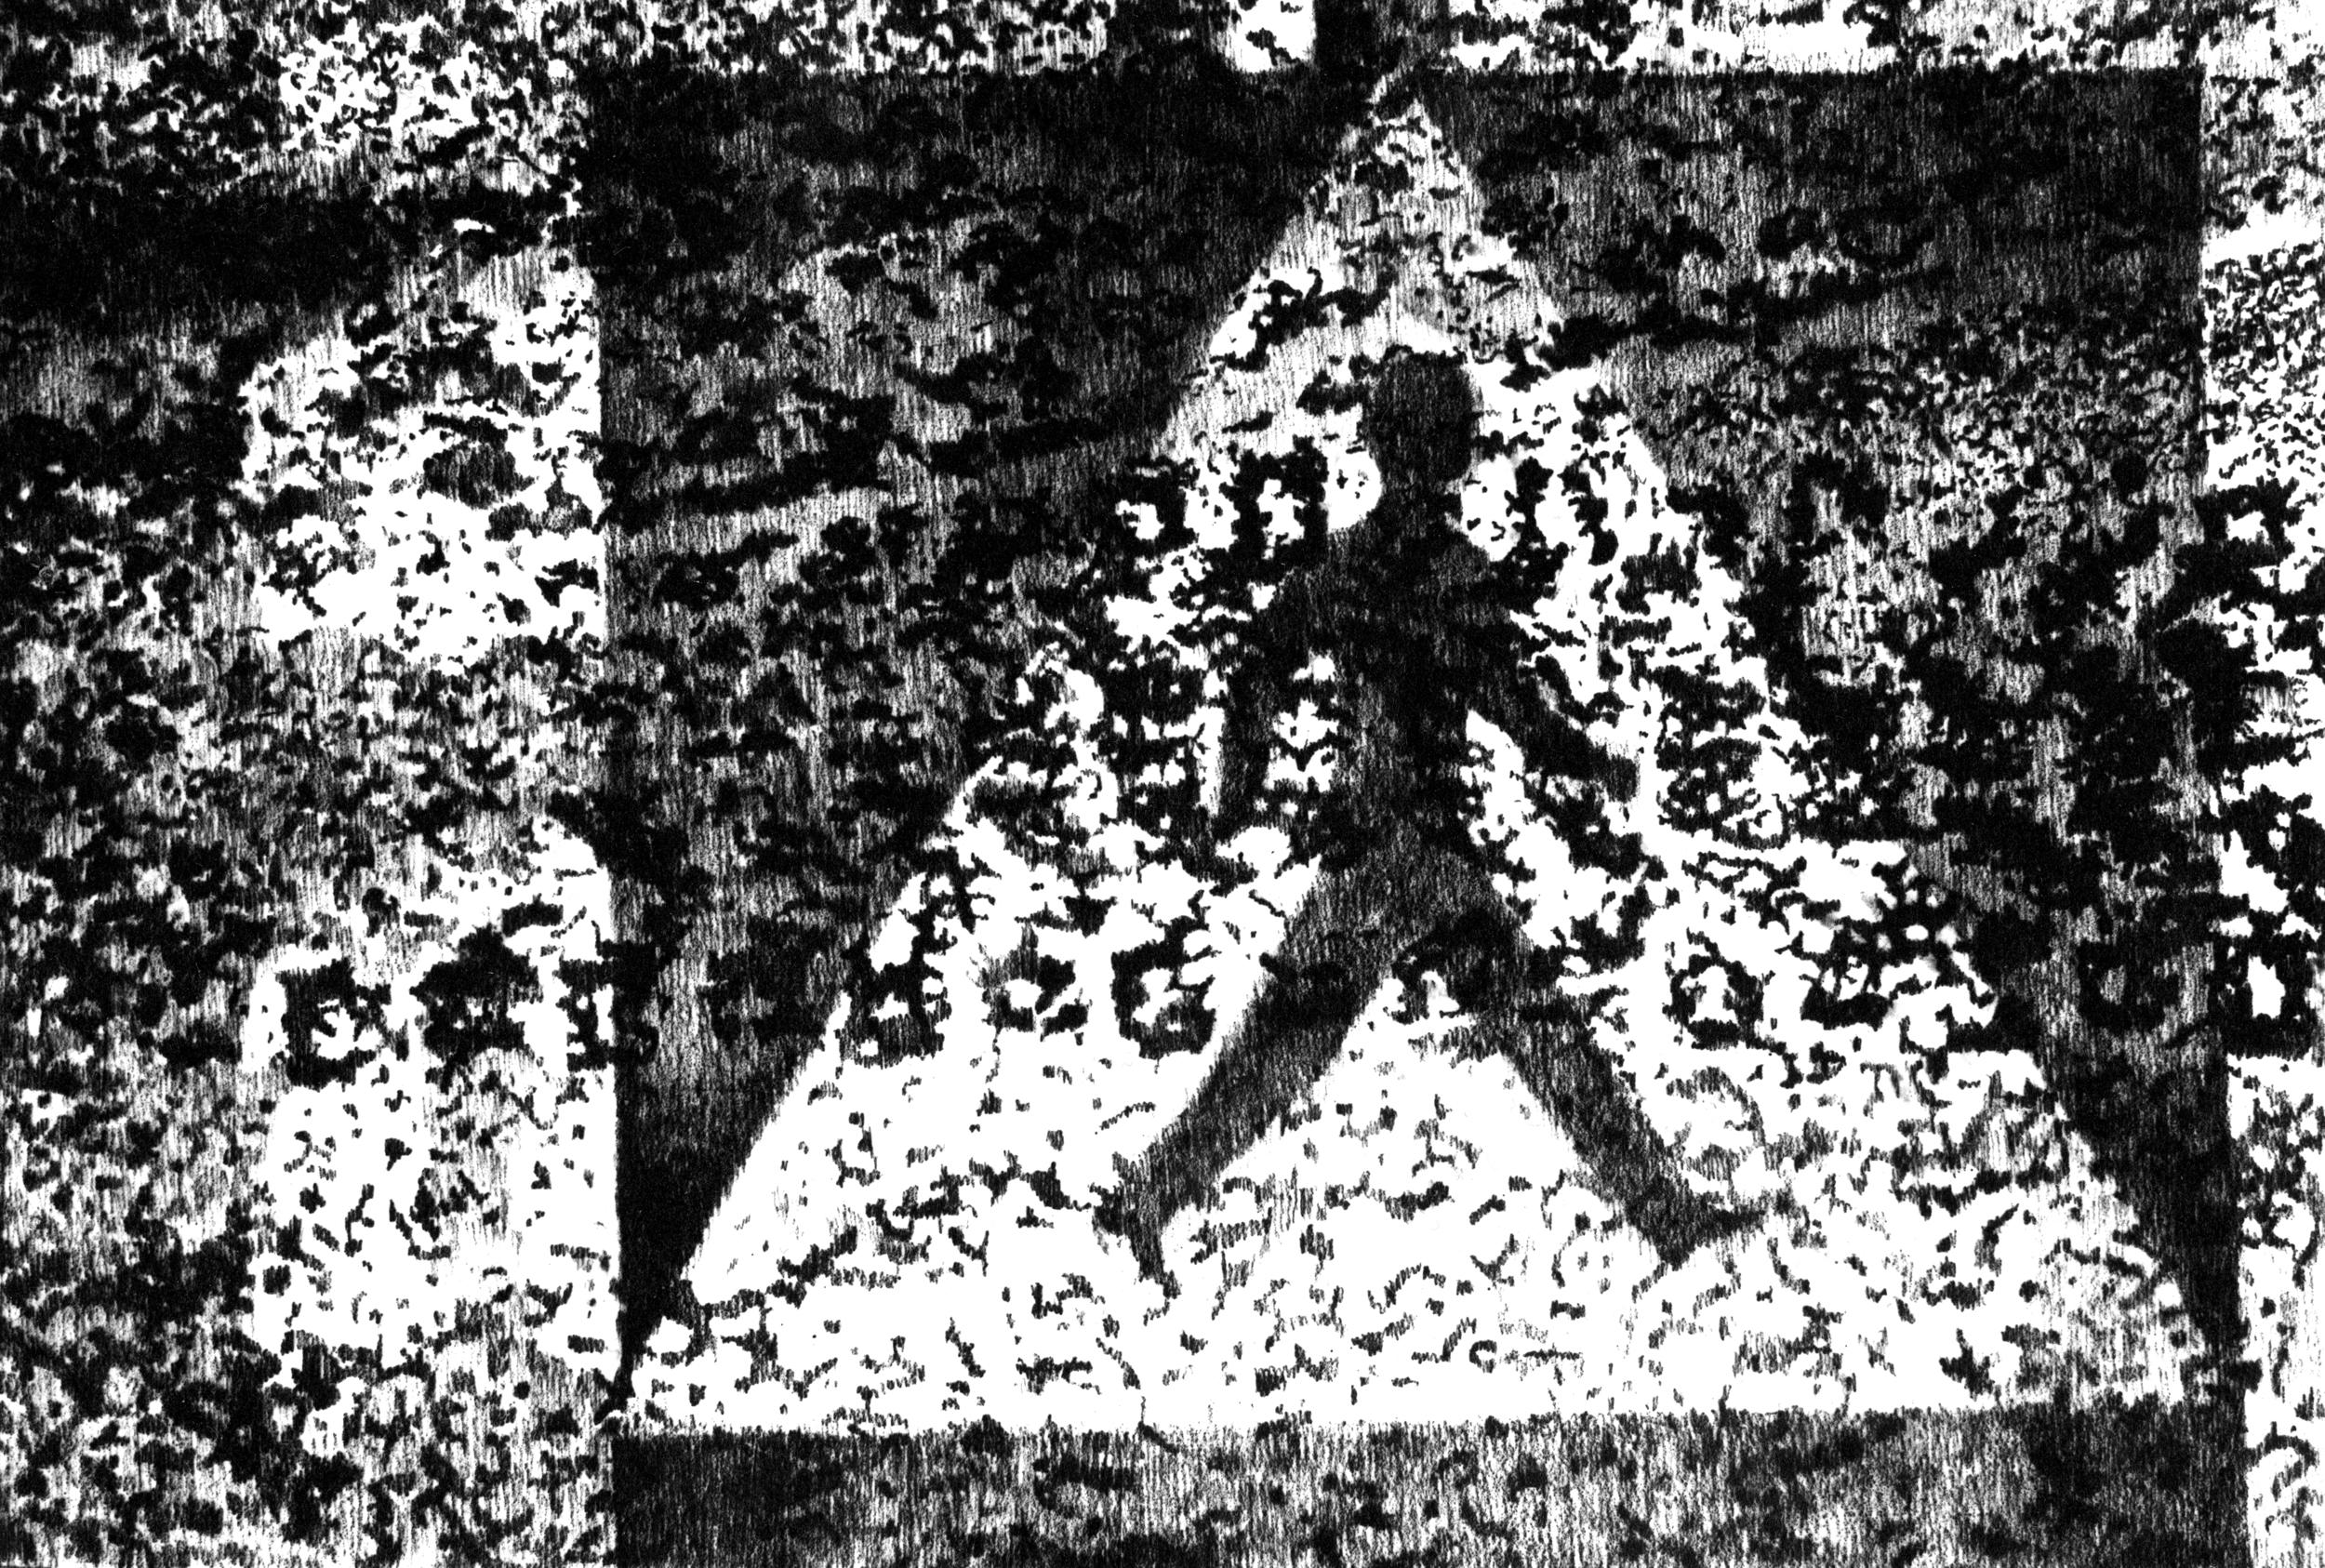 Maria Adlercreutz, Kompis, 1967, 67 x 95 cm, blyerts på papper